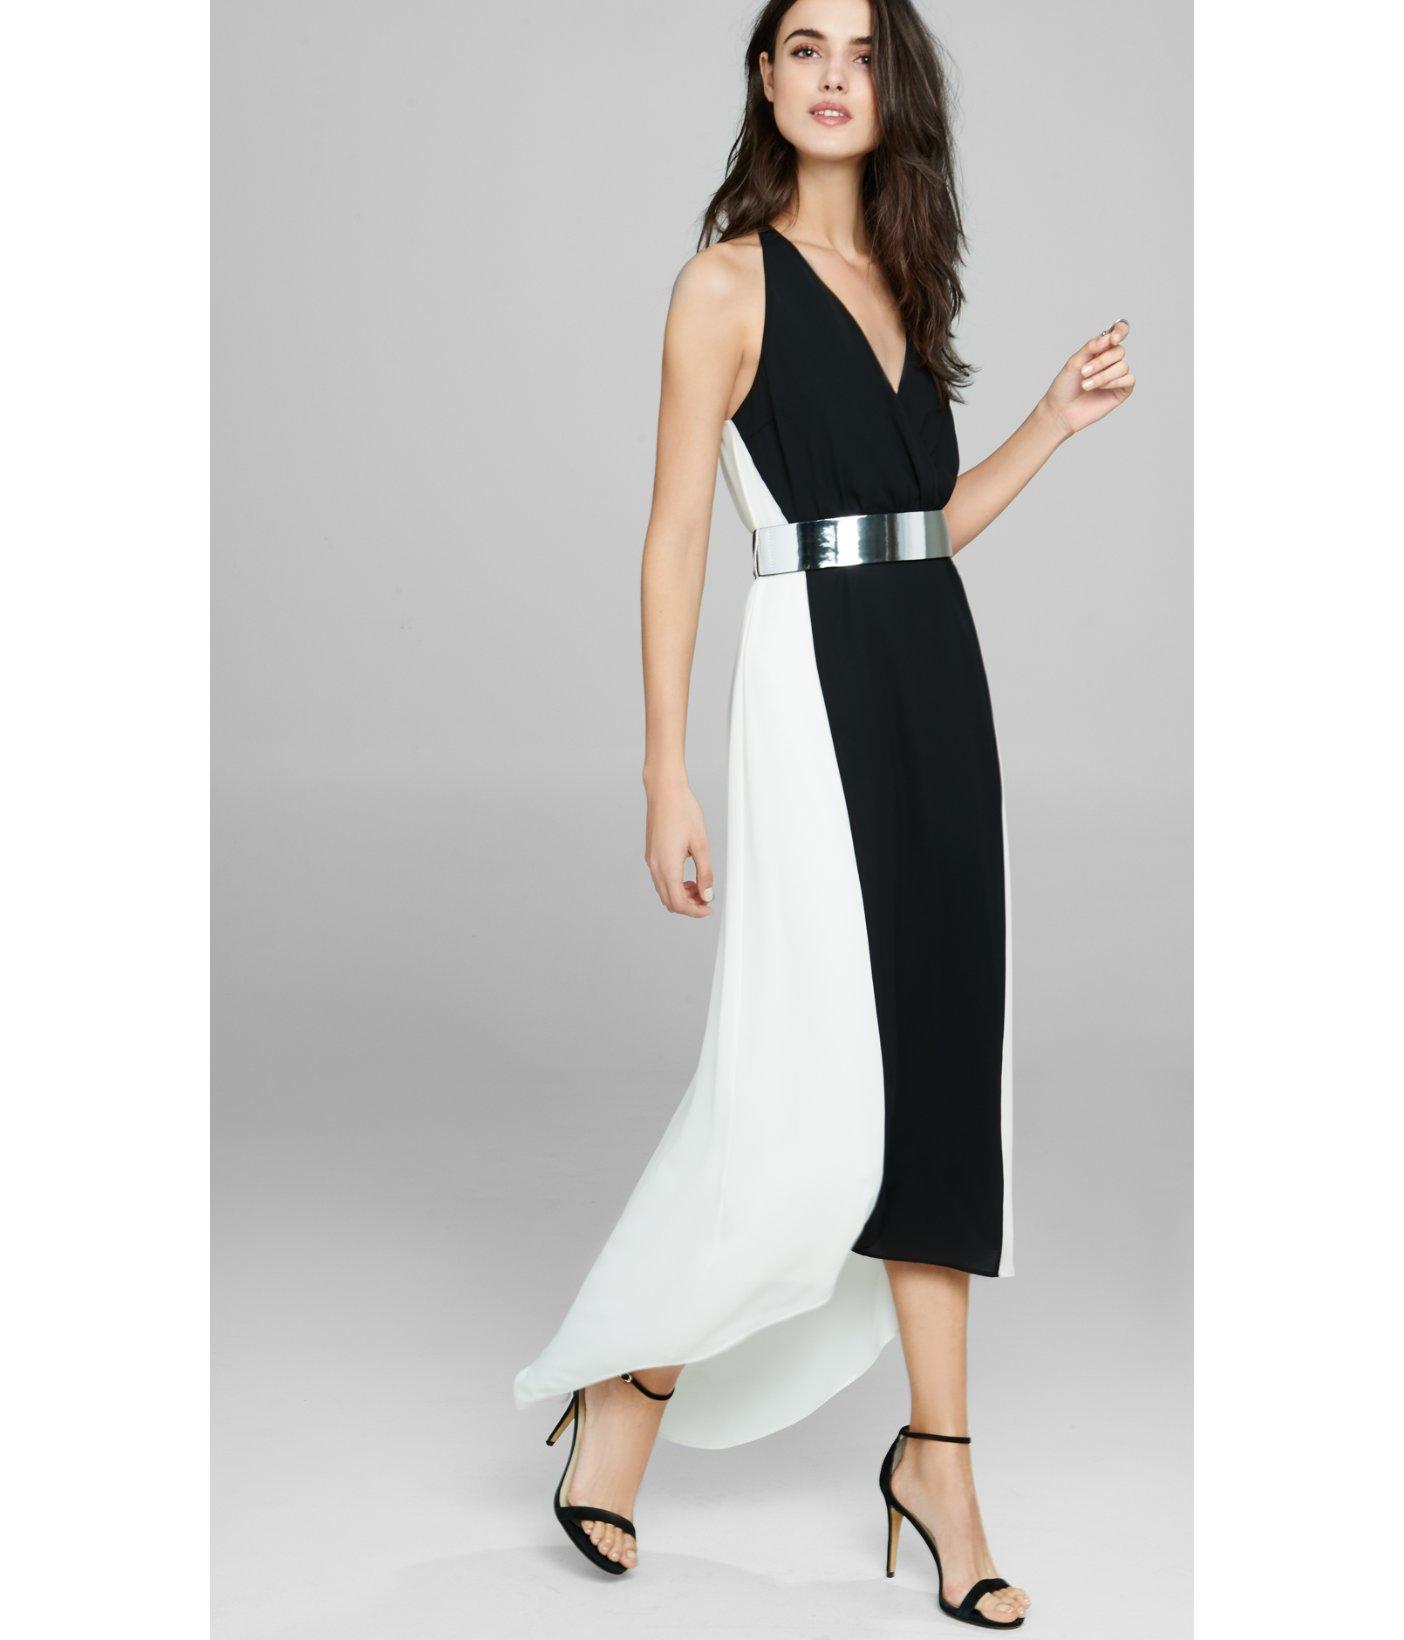 Express Sleeveless Color Block Metallic Belt Maxi Dress In